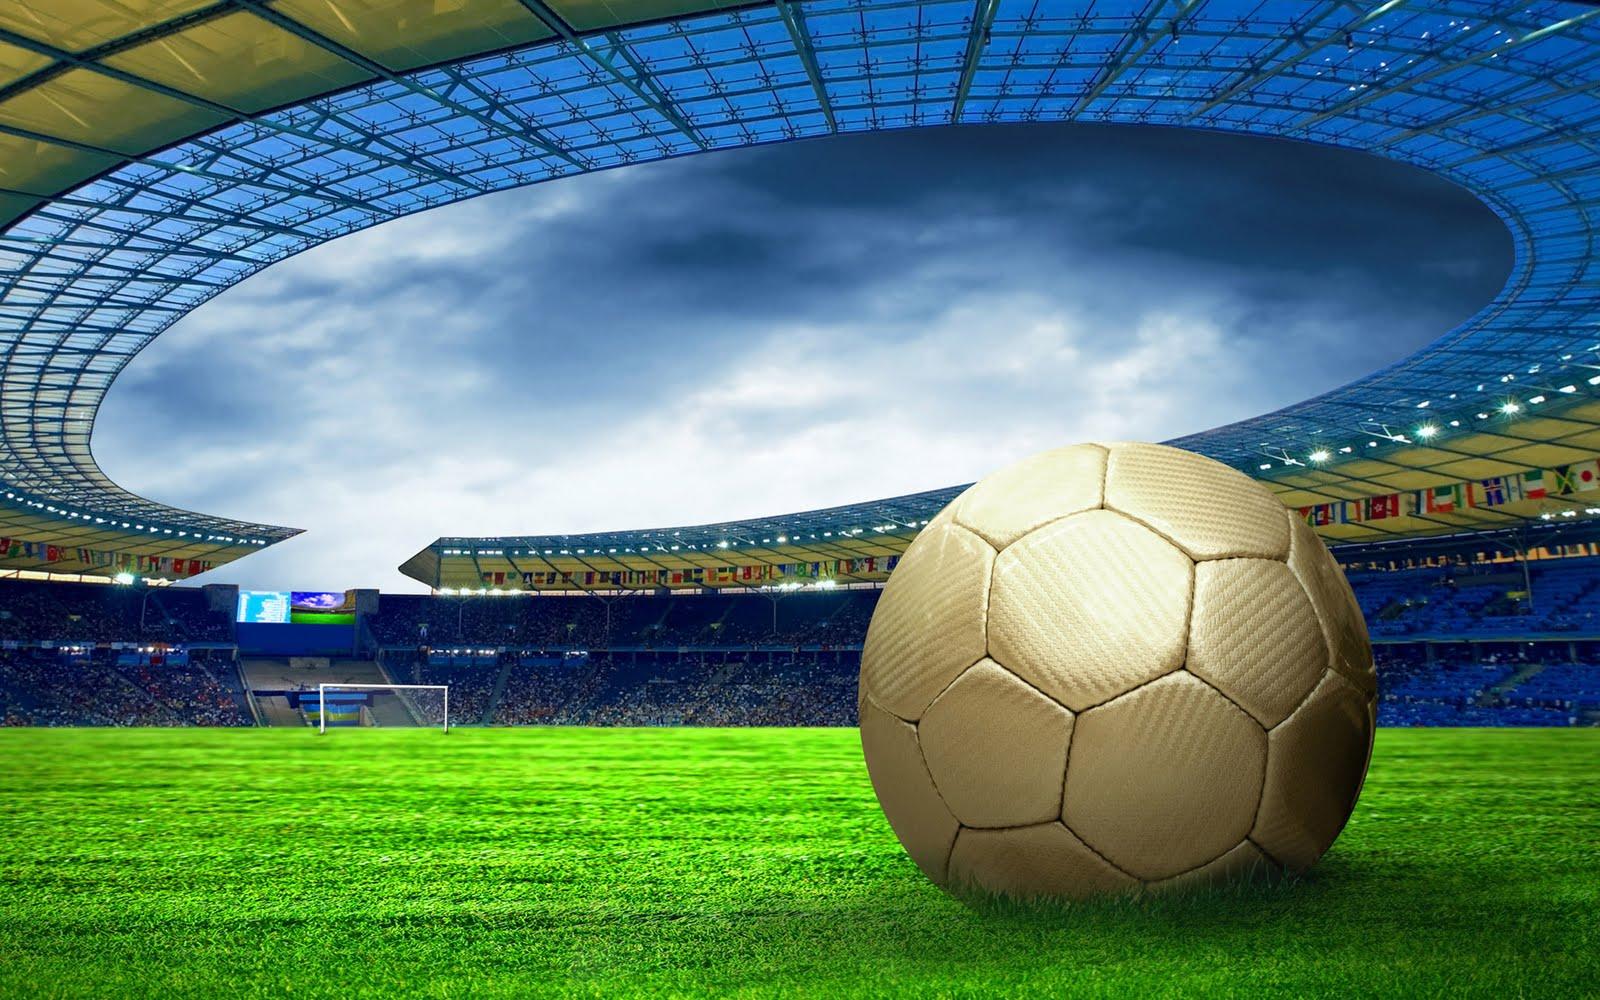 http://4.bp.blogspot.com/_JMdl-D4Jq6w/TDn8JSvDgjI/AAAAAAAANFs/Vzf_JBf1lzk/s1600/HD_Soccer_26.jpg